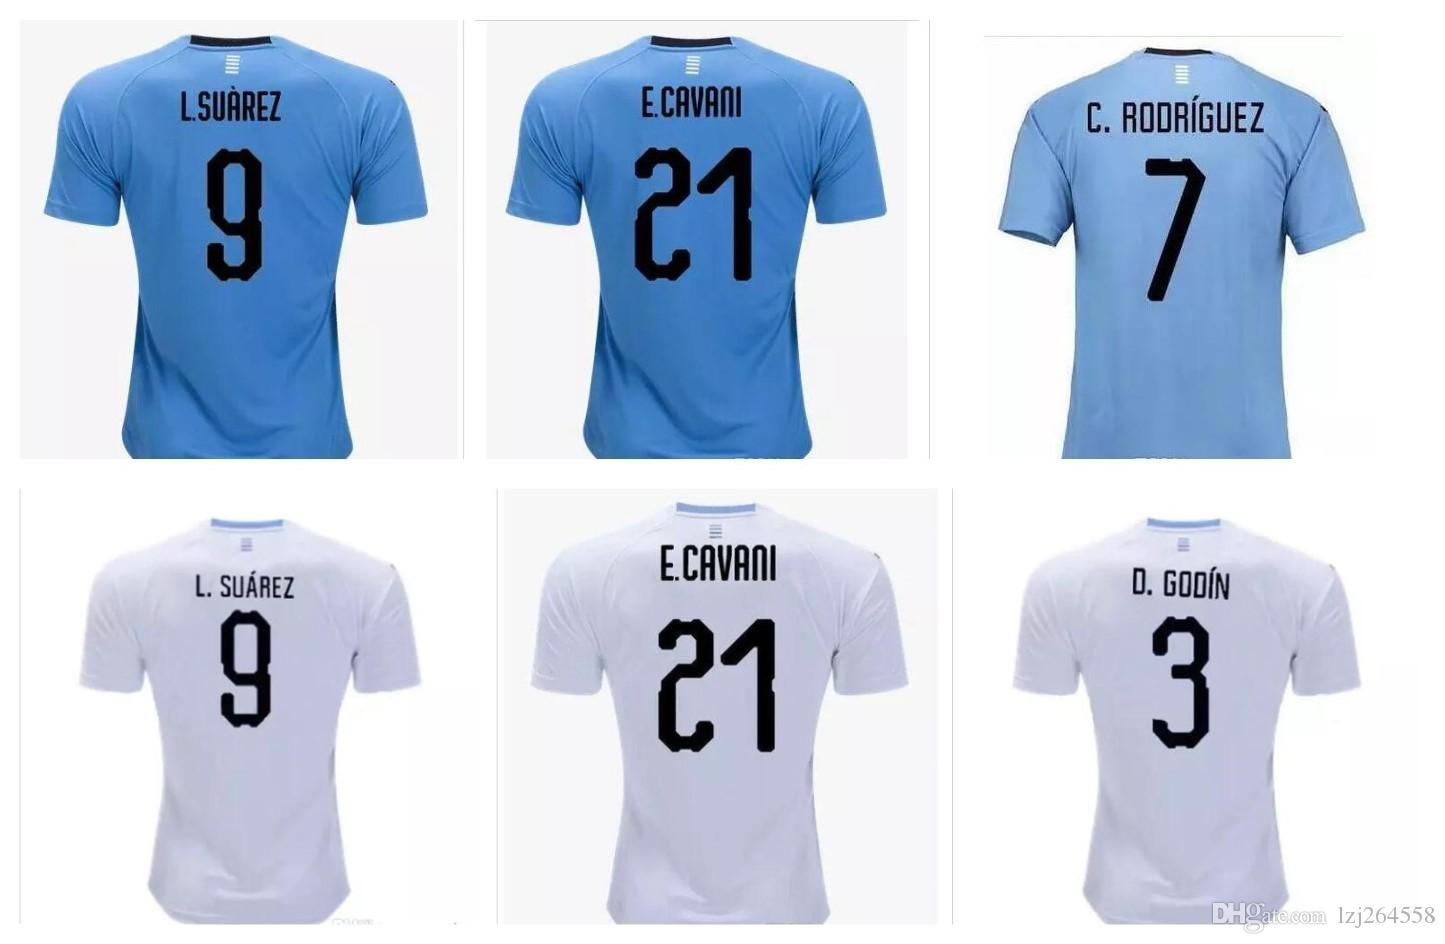 a4bcf37c93e48 2019 Whosales Camisa Uruguay 2018 World Cup Soccer Jerseys